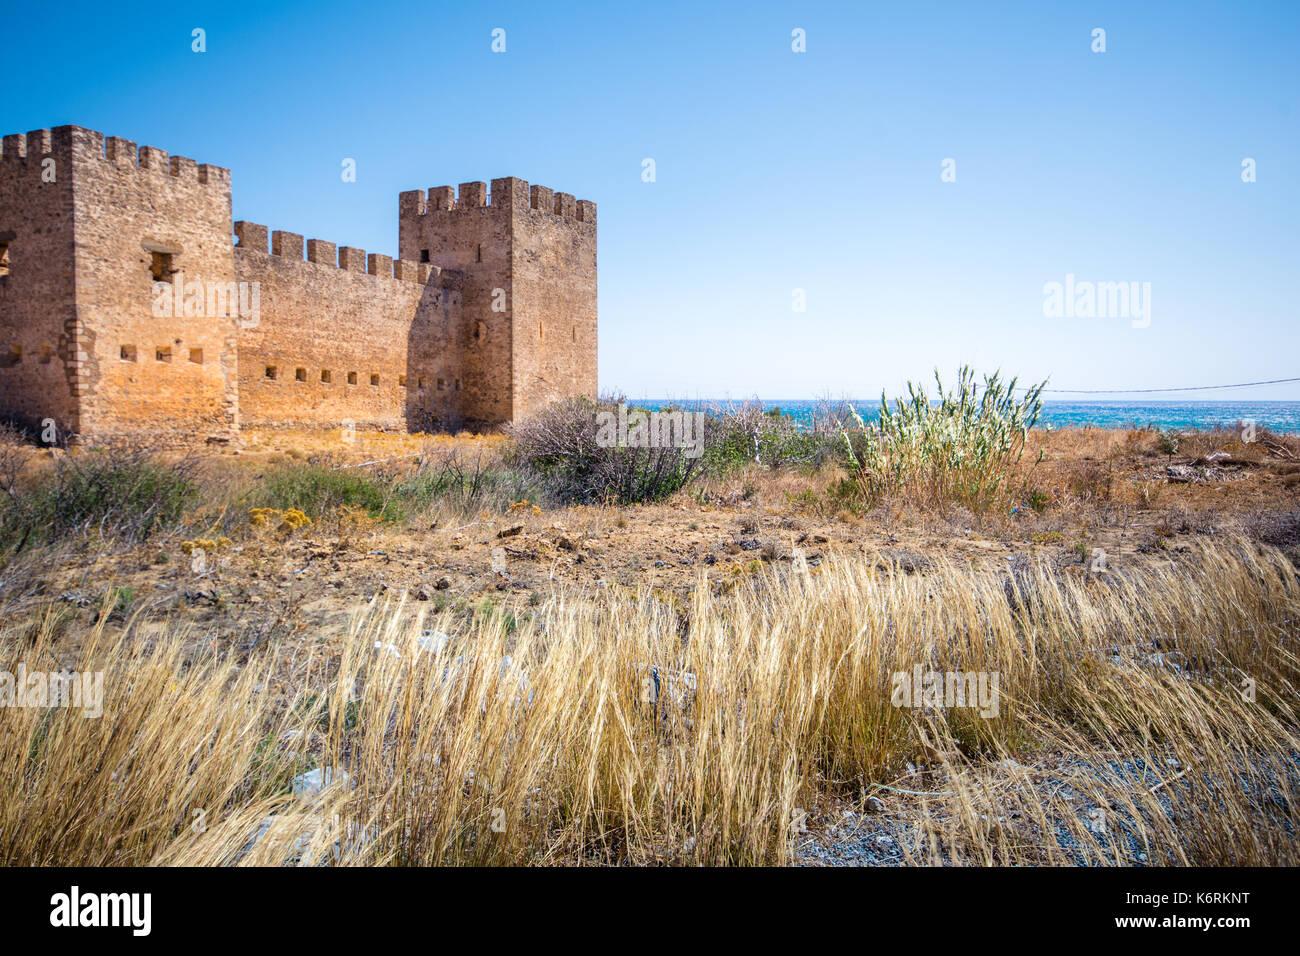 Castle at Frangokastello beach, Crete, Greece Stock Photo